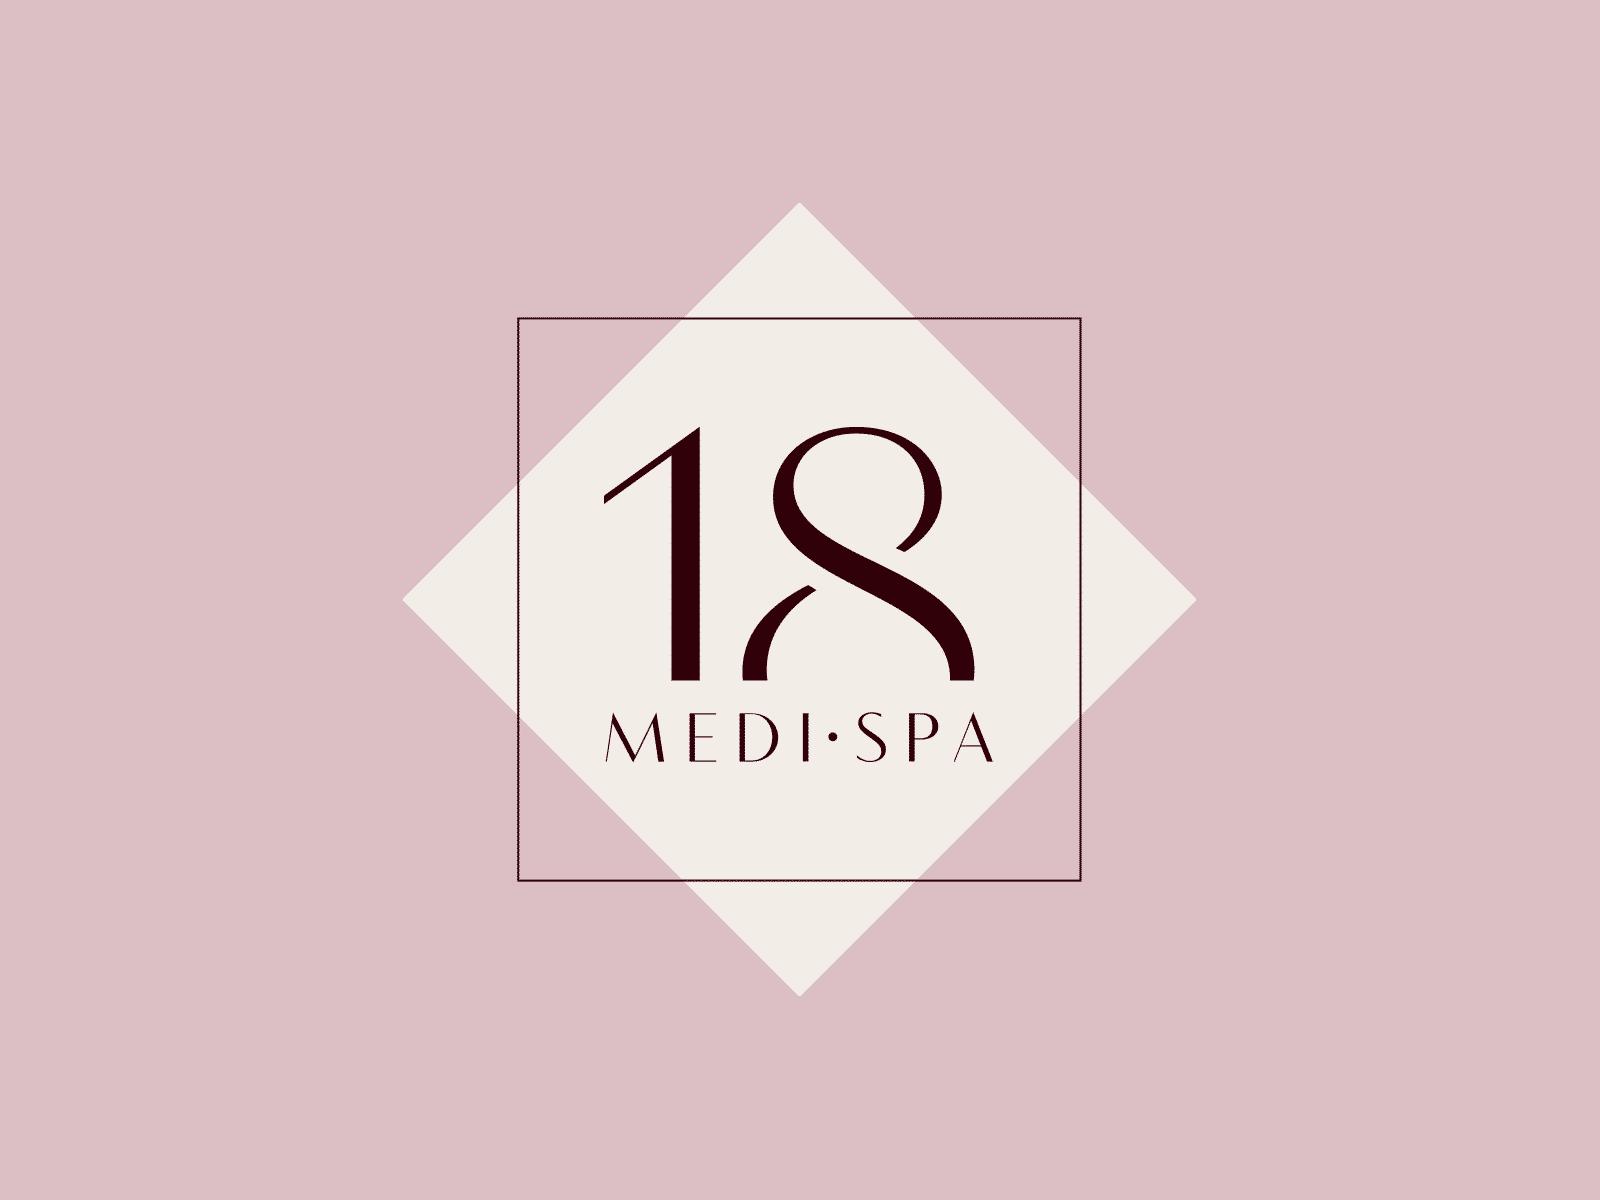 18medispa_logo_dribbble1